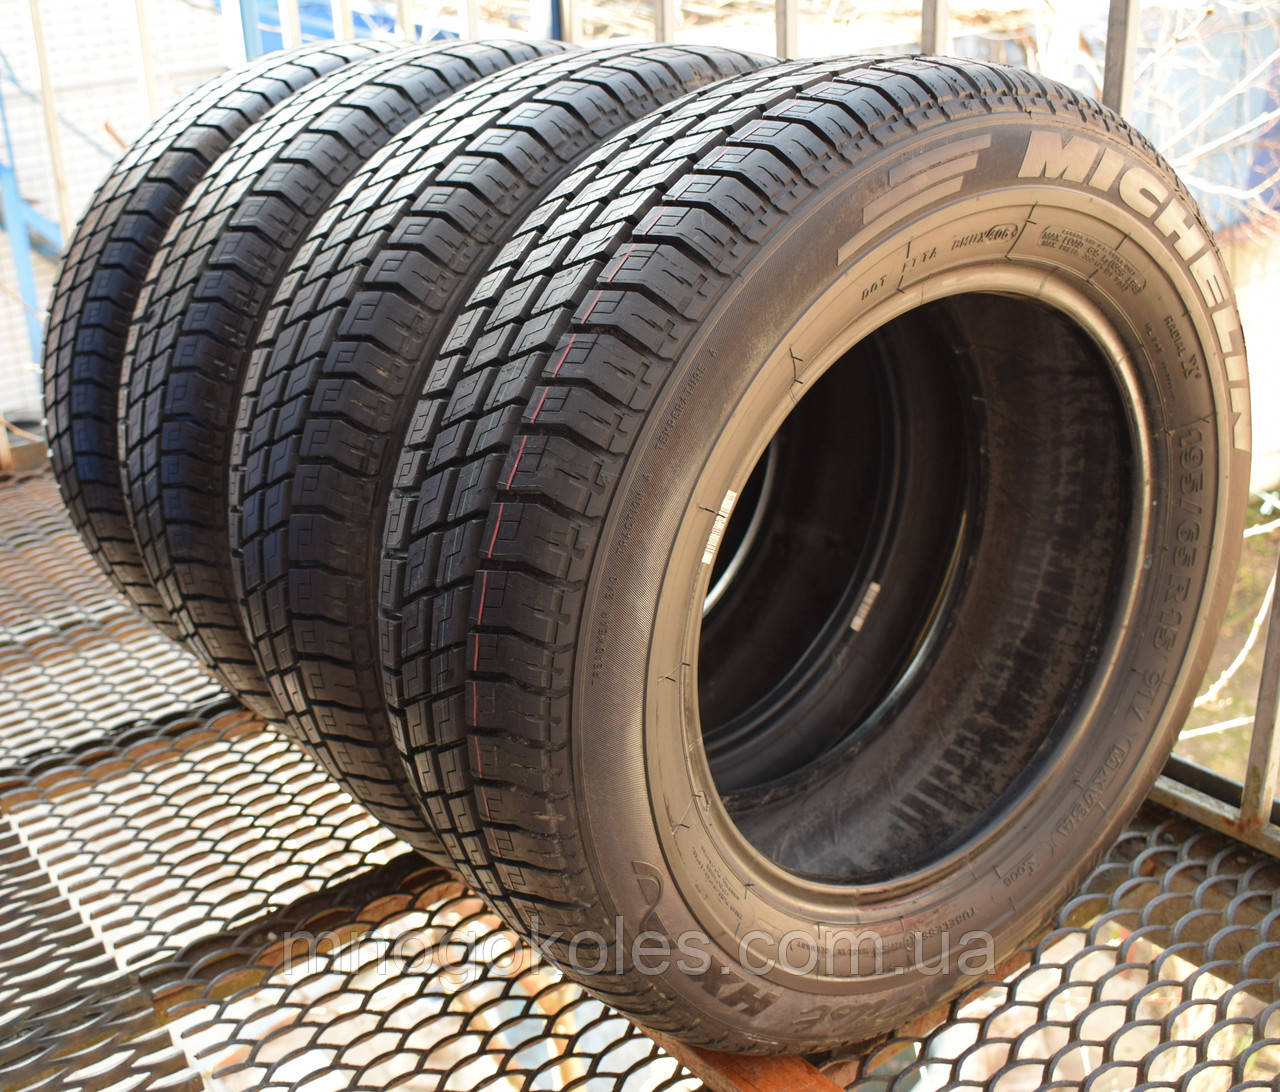 Шины б/у 195/65 R15 Michelin Pilot HX, ЛЕТО, 8 мм, комплект